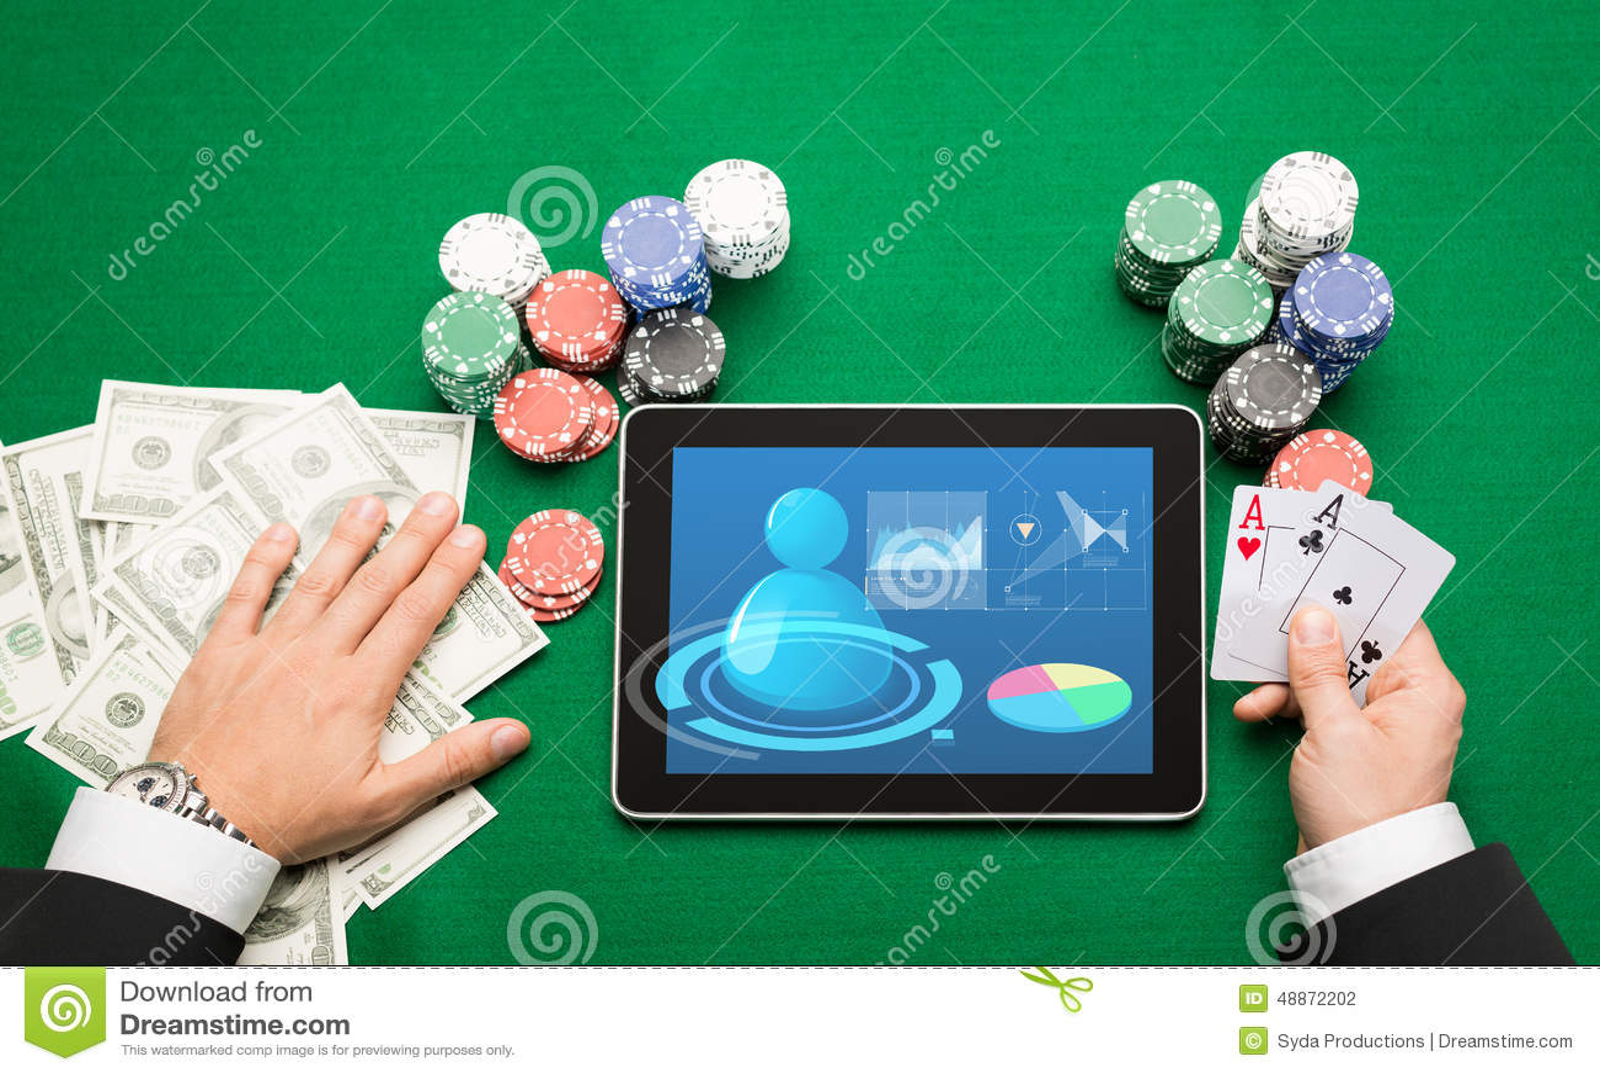 online tablet casino